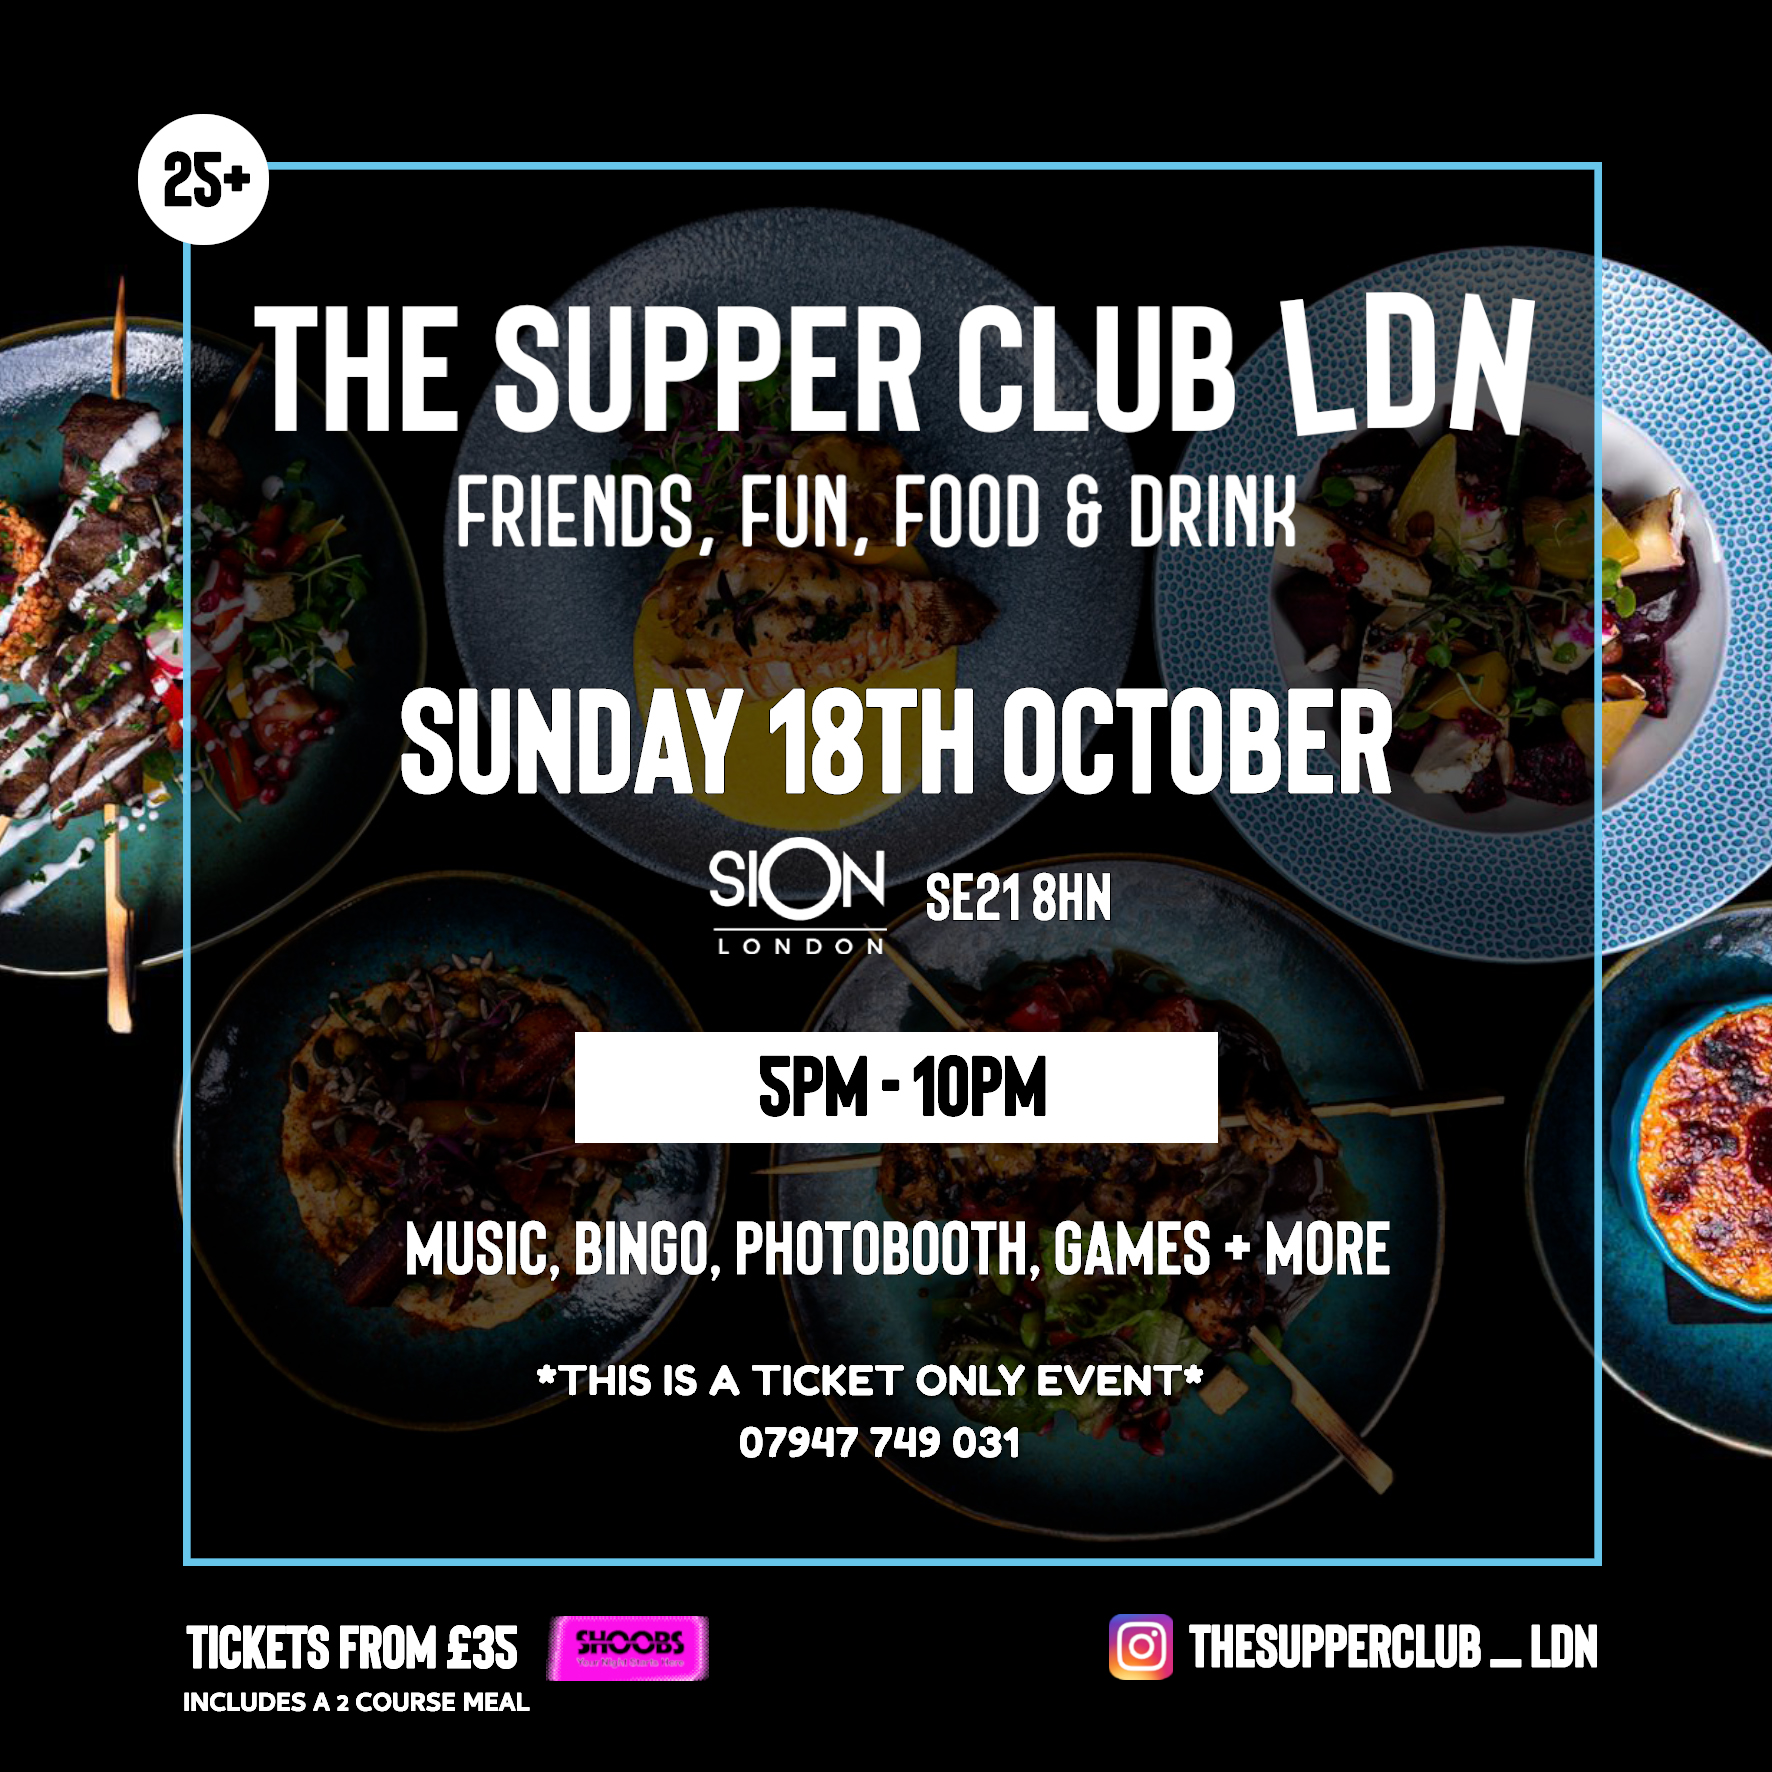 The Supper Club LDN - Sun OCT 18th (5pm-10pm)